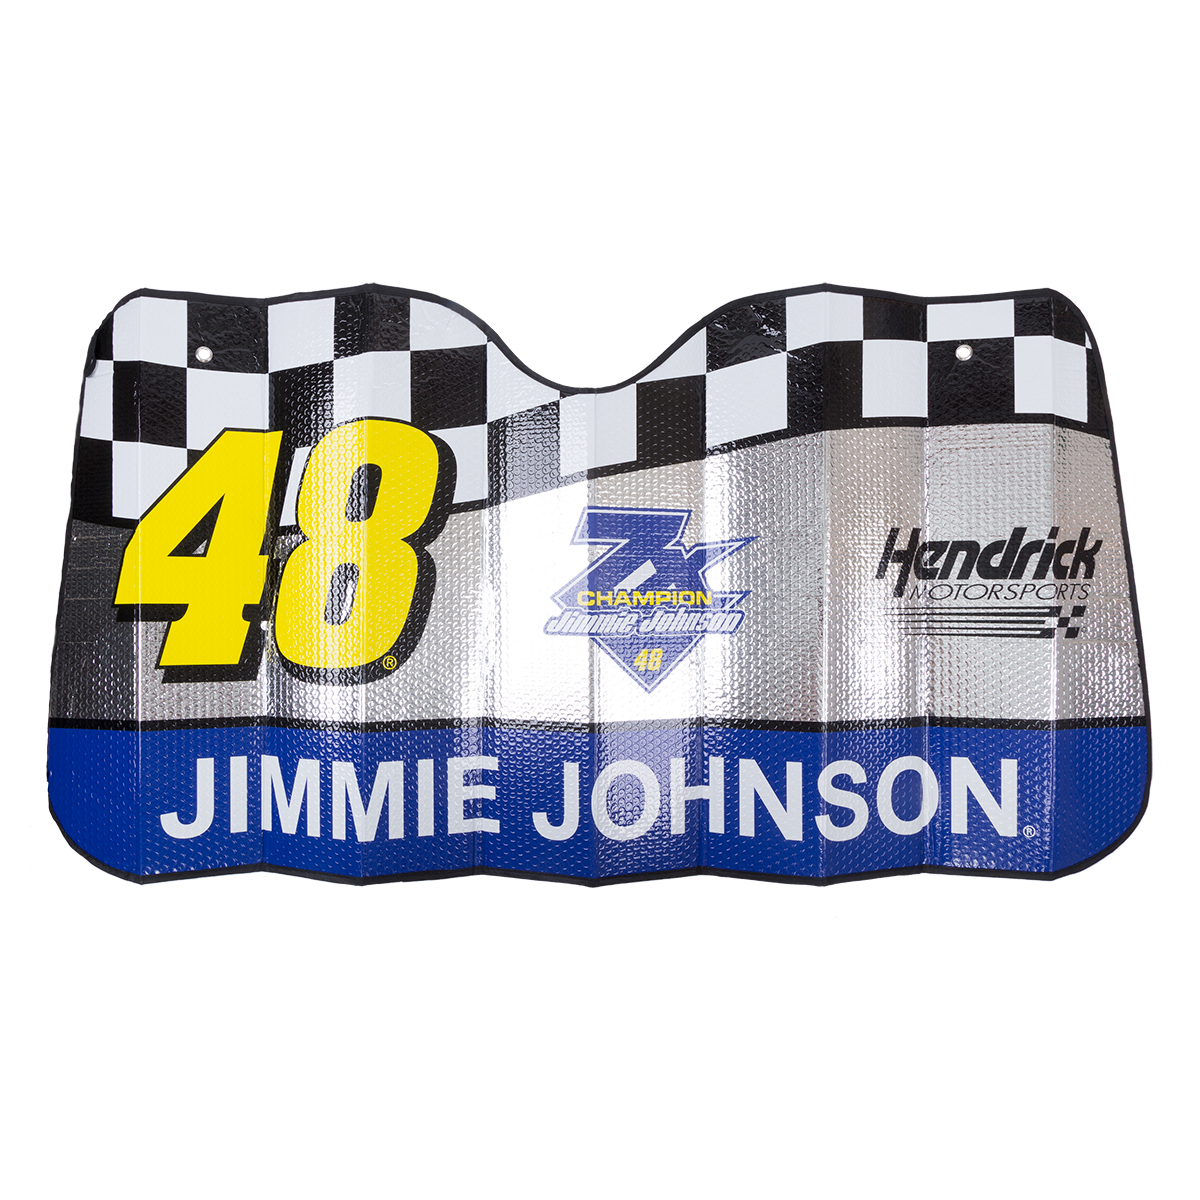 Jimmie Johnson #48 Sunshade